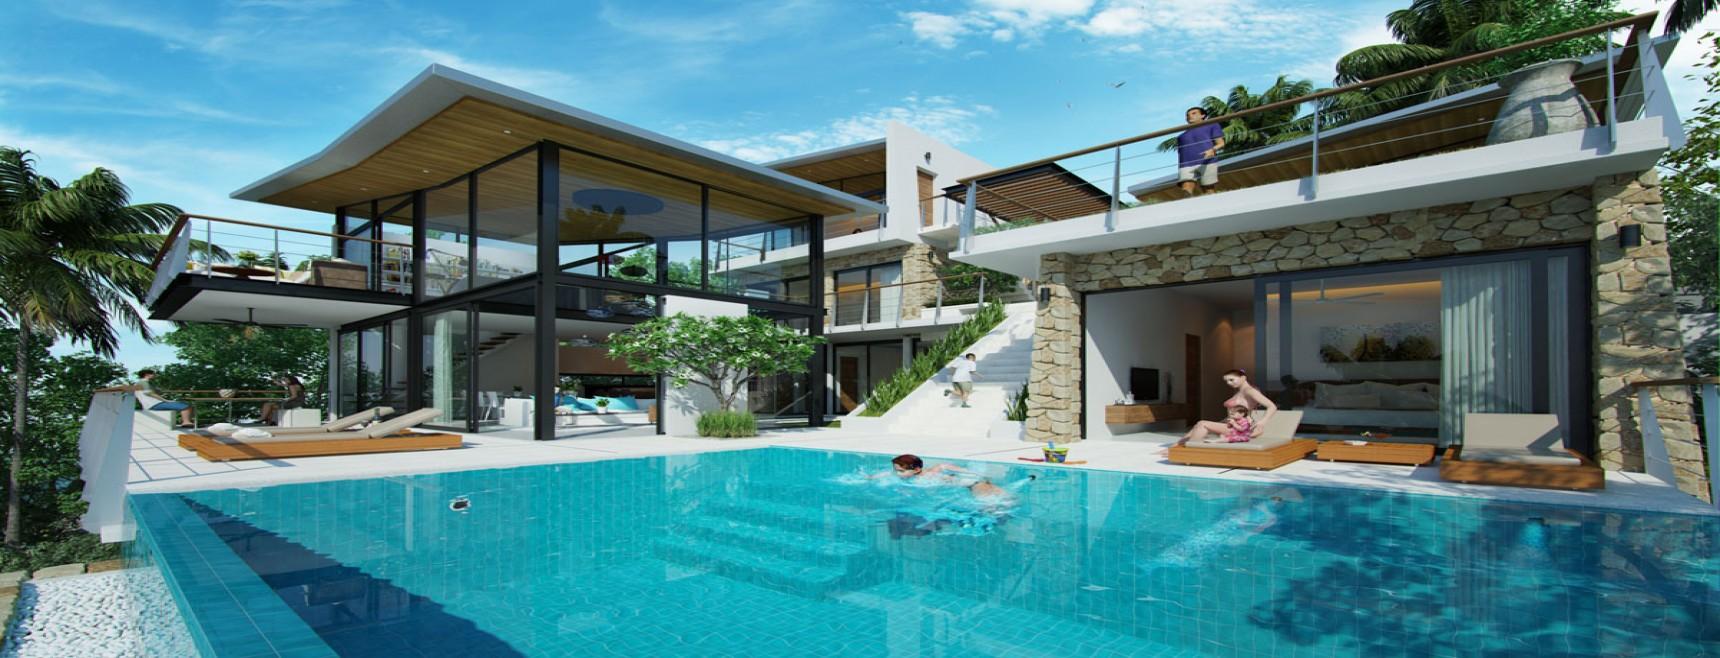 6 Bedrooms, Villa, Residential Sales, 7 Bathrooms, Listing ID 1281, Koh Samui,